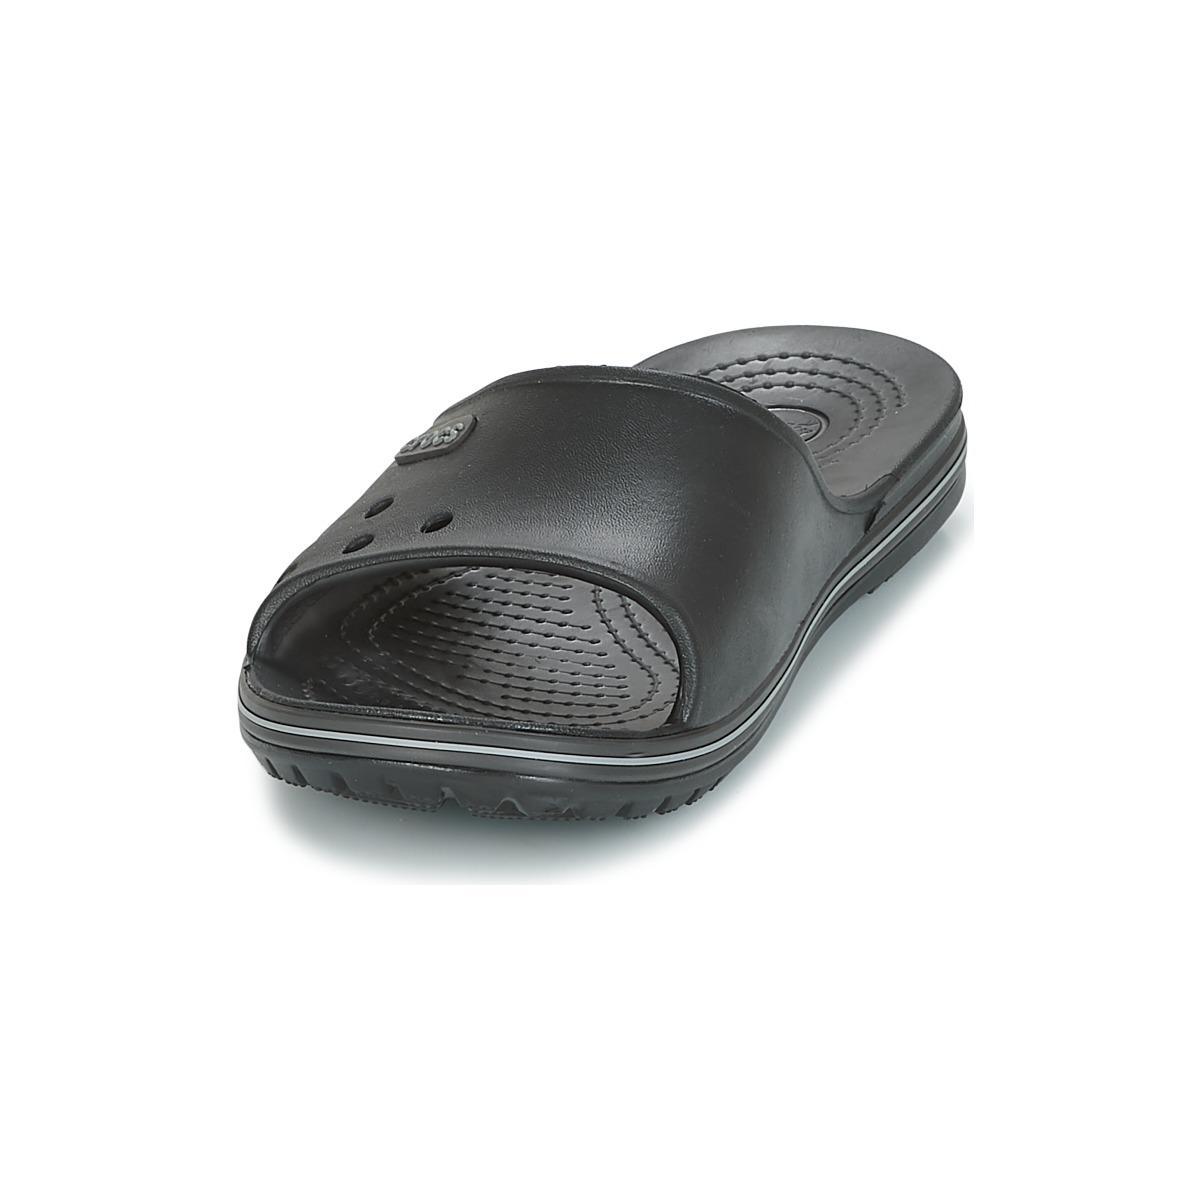 419306c18b65 Crocs™ - Crocband Ii Slide Men s Sandals In Black for Men - Lyst. View  fullscreen